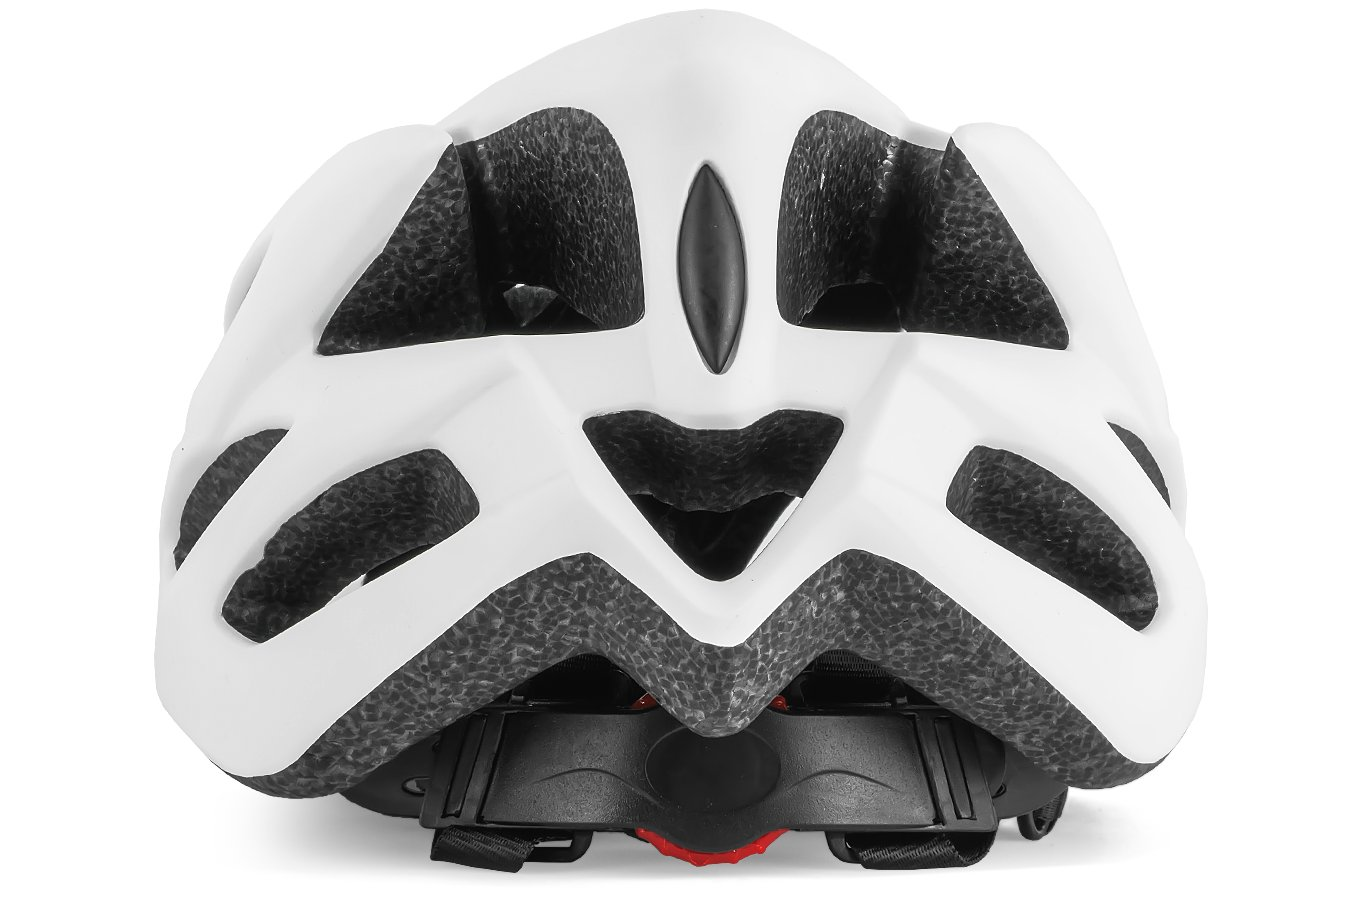 Capacete Ciclista INM Revo Fosco - High One